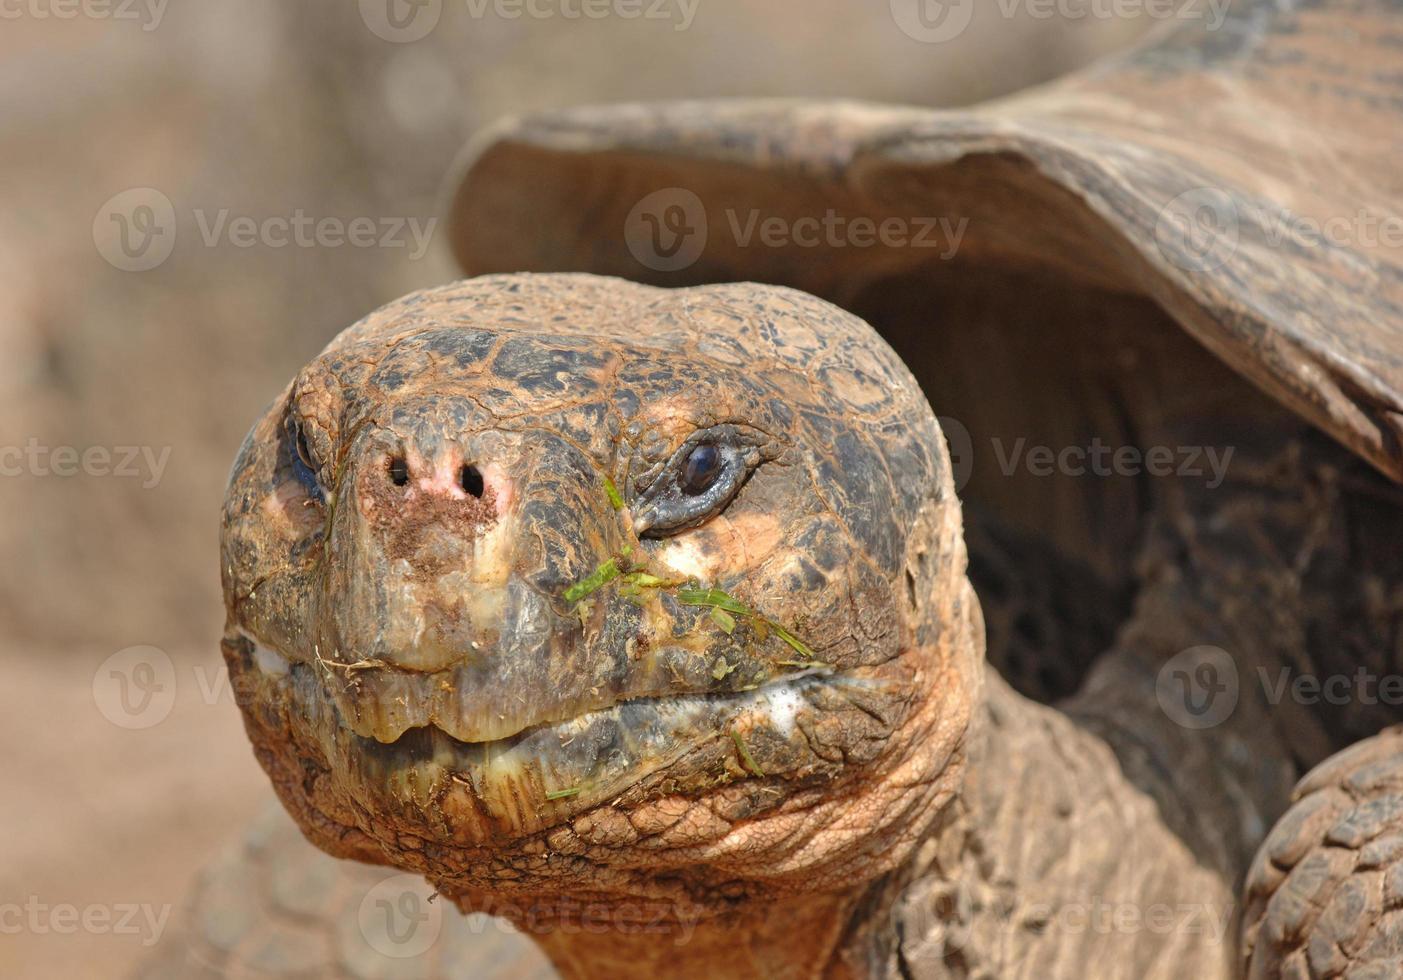 tartaruga gigante, isole galapagos, ecuador foto